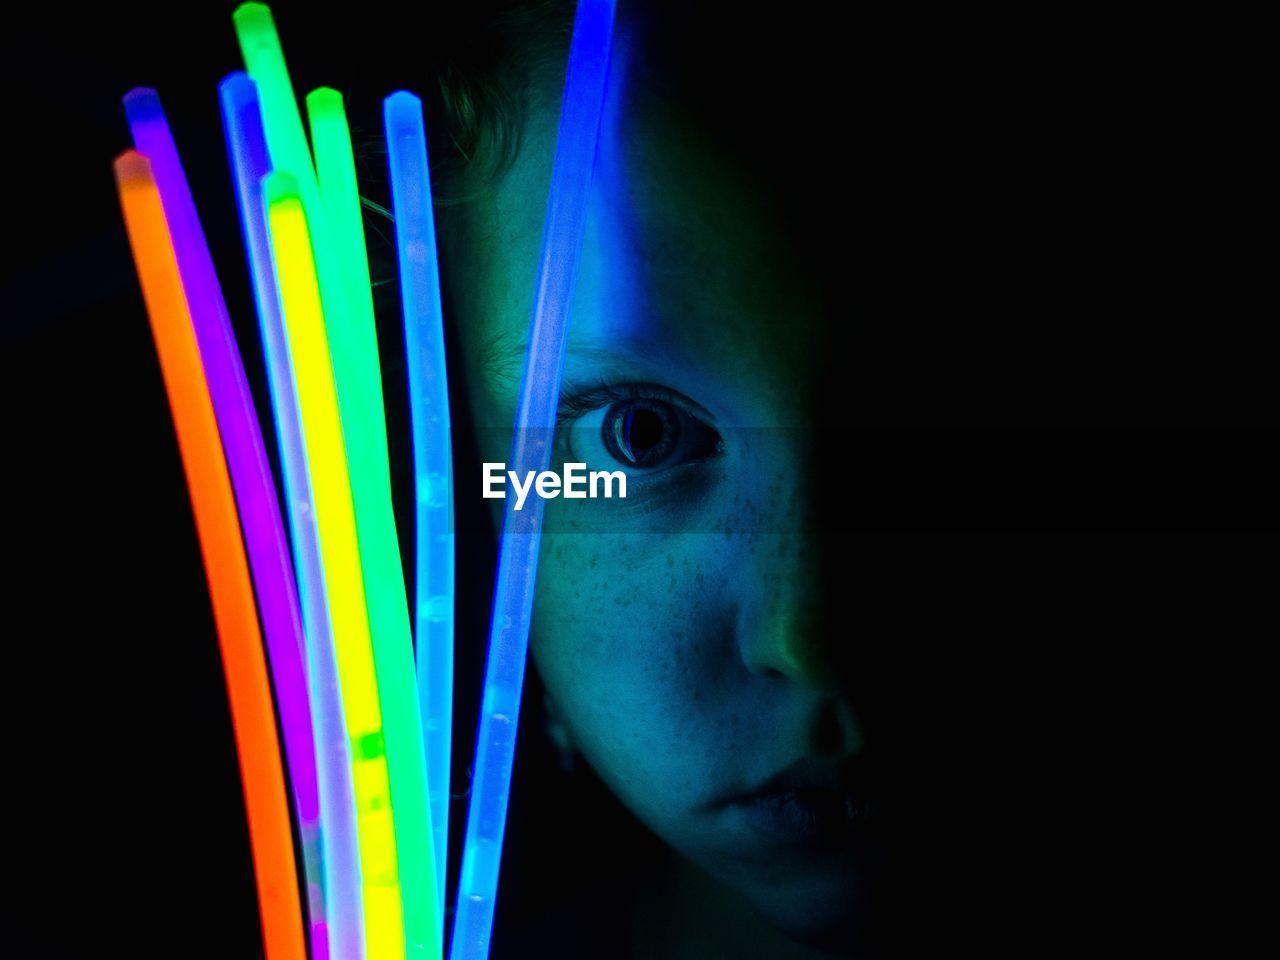 Portrait Of Girl Holding Glow Sticks Against Black Background